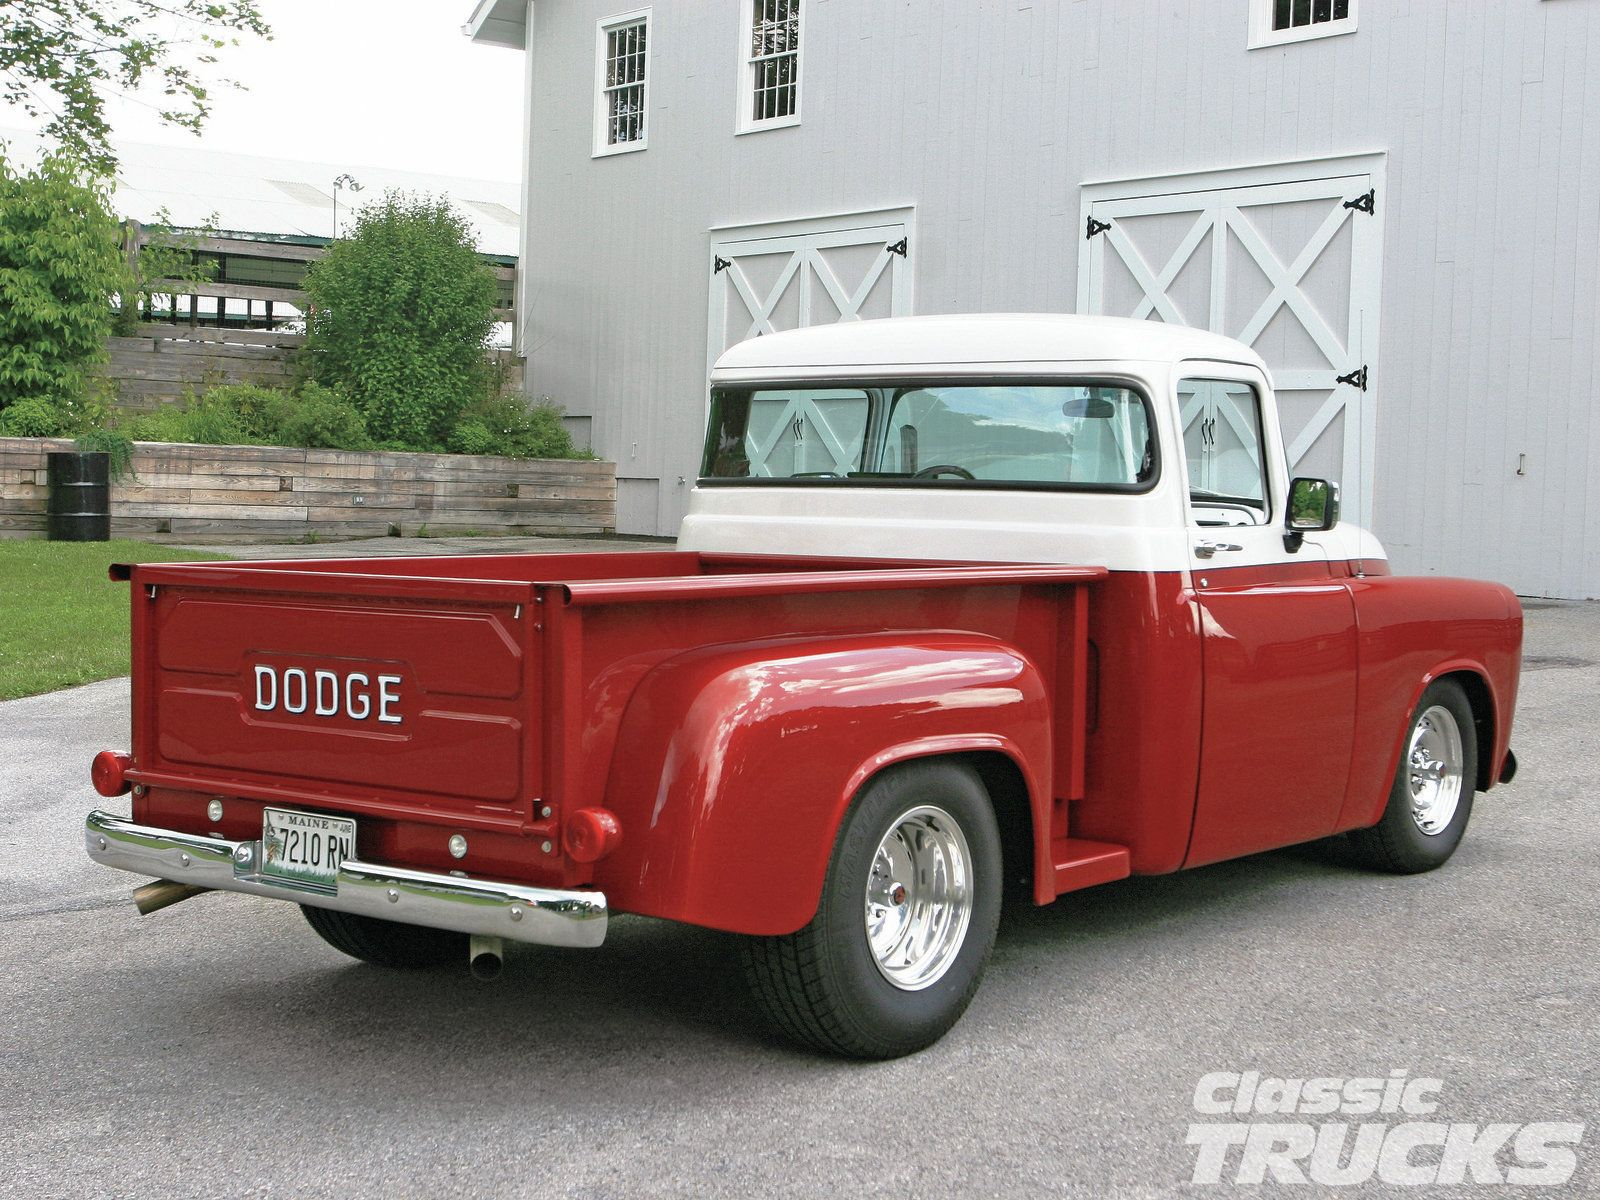 Classic Dodge Trucks 1957 Dodge Truck Rear Photo 4 Old Dodge